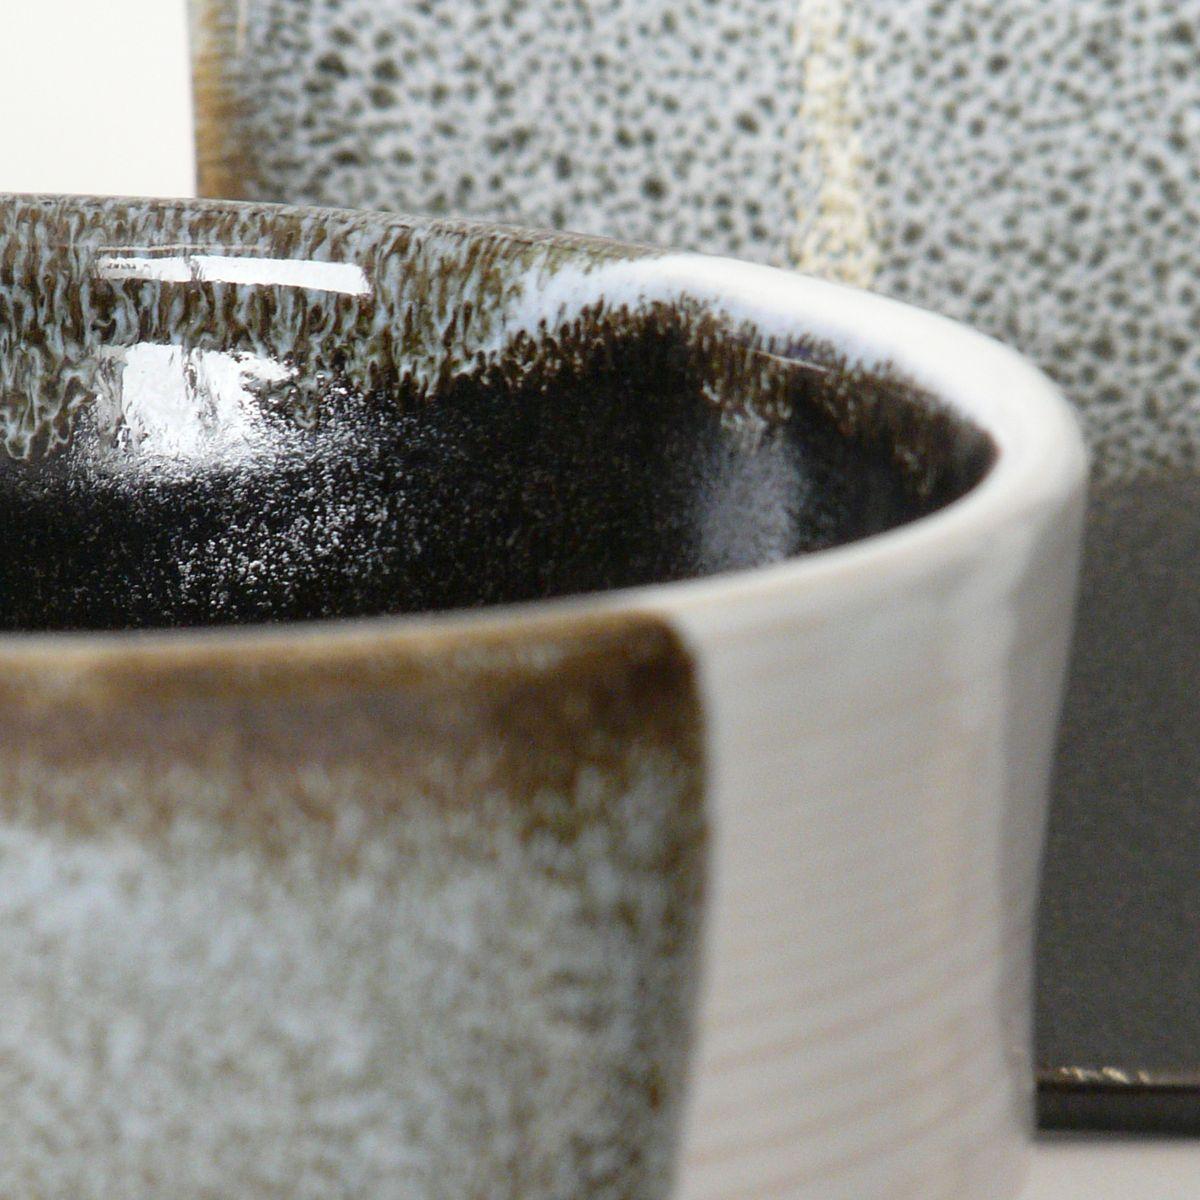 Artesania ceramica de alta temperatura: Gres